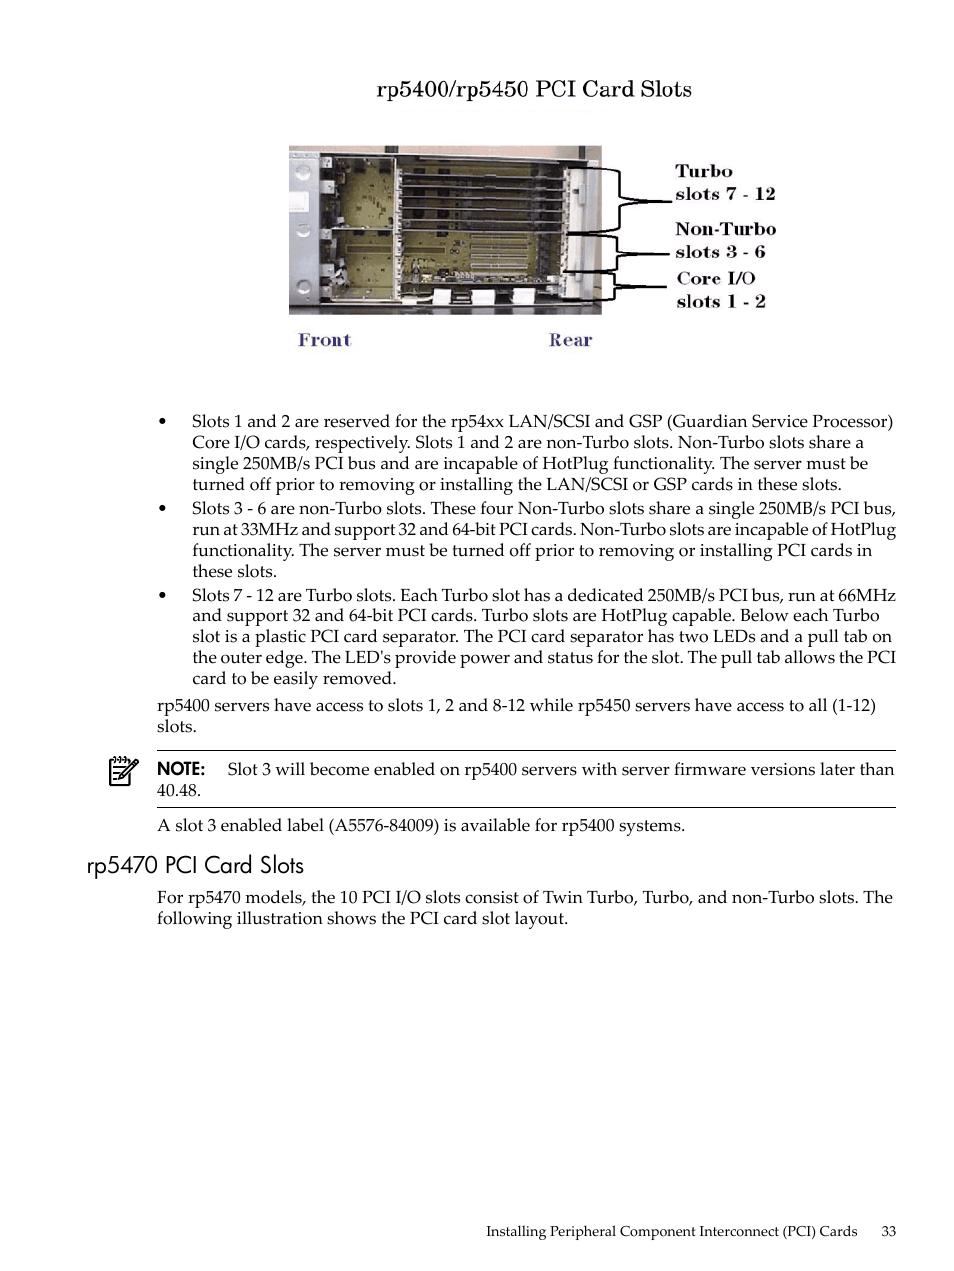 rp5470 pci card slots hp 9000 rp5400 servers user manual page 33 rh manualsdir com hp hdx 9000 service manual hp hdx 9000 manual